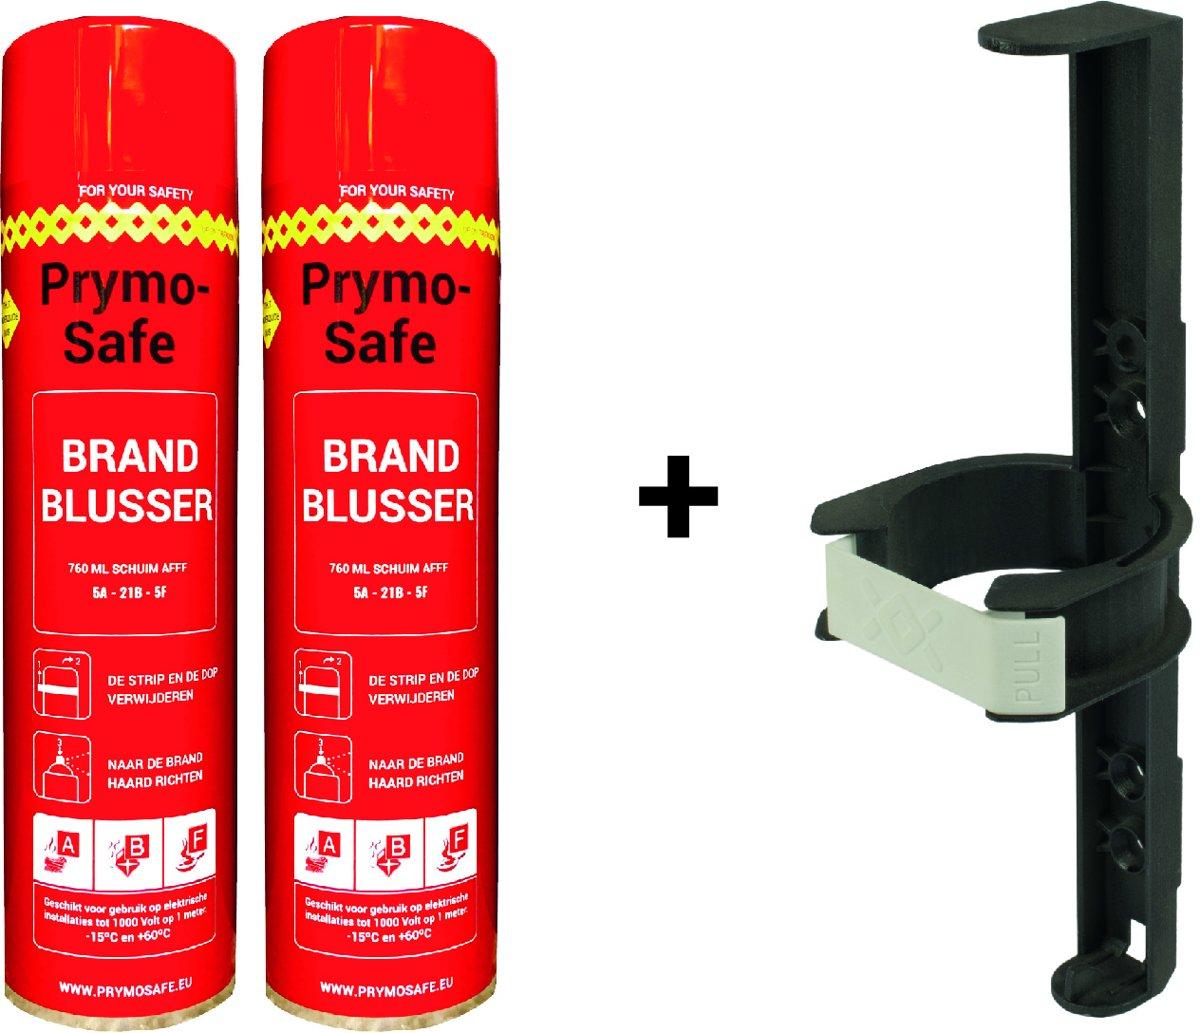 2x Prymosafe, Universele spray-blusser, inhoud 760 ml, 1 Brandblusser voor alle meest voorkomende beginnende branden inclusief 1 cliphouder.